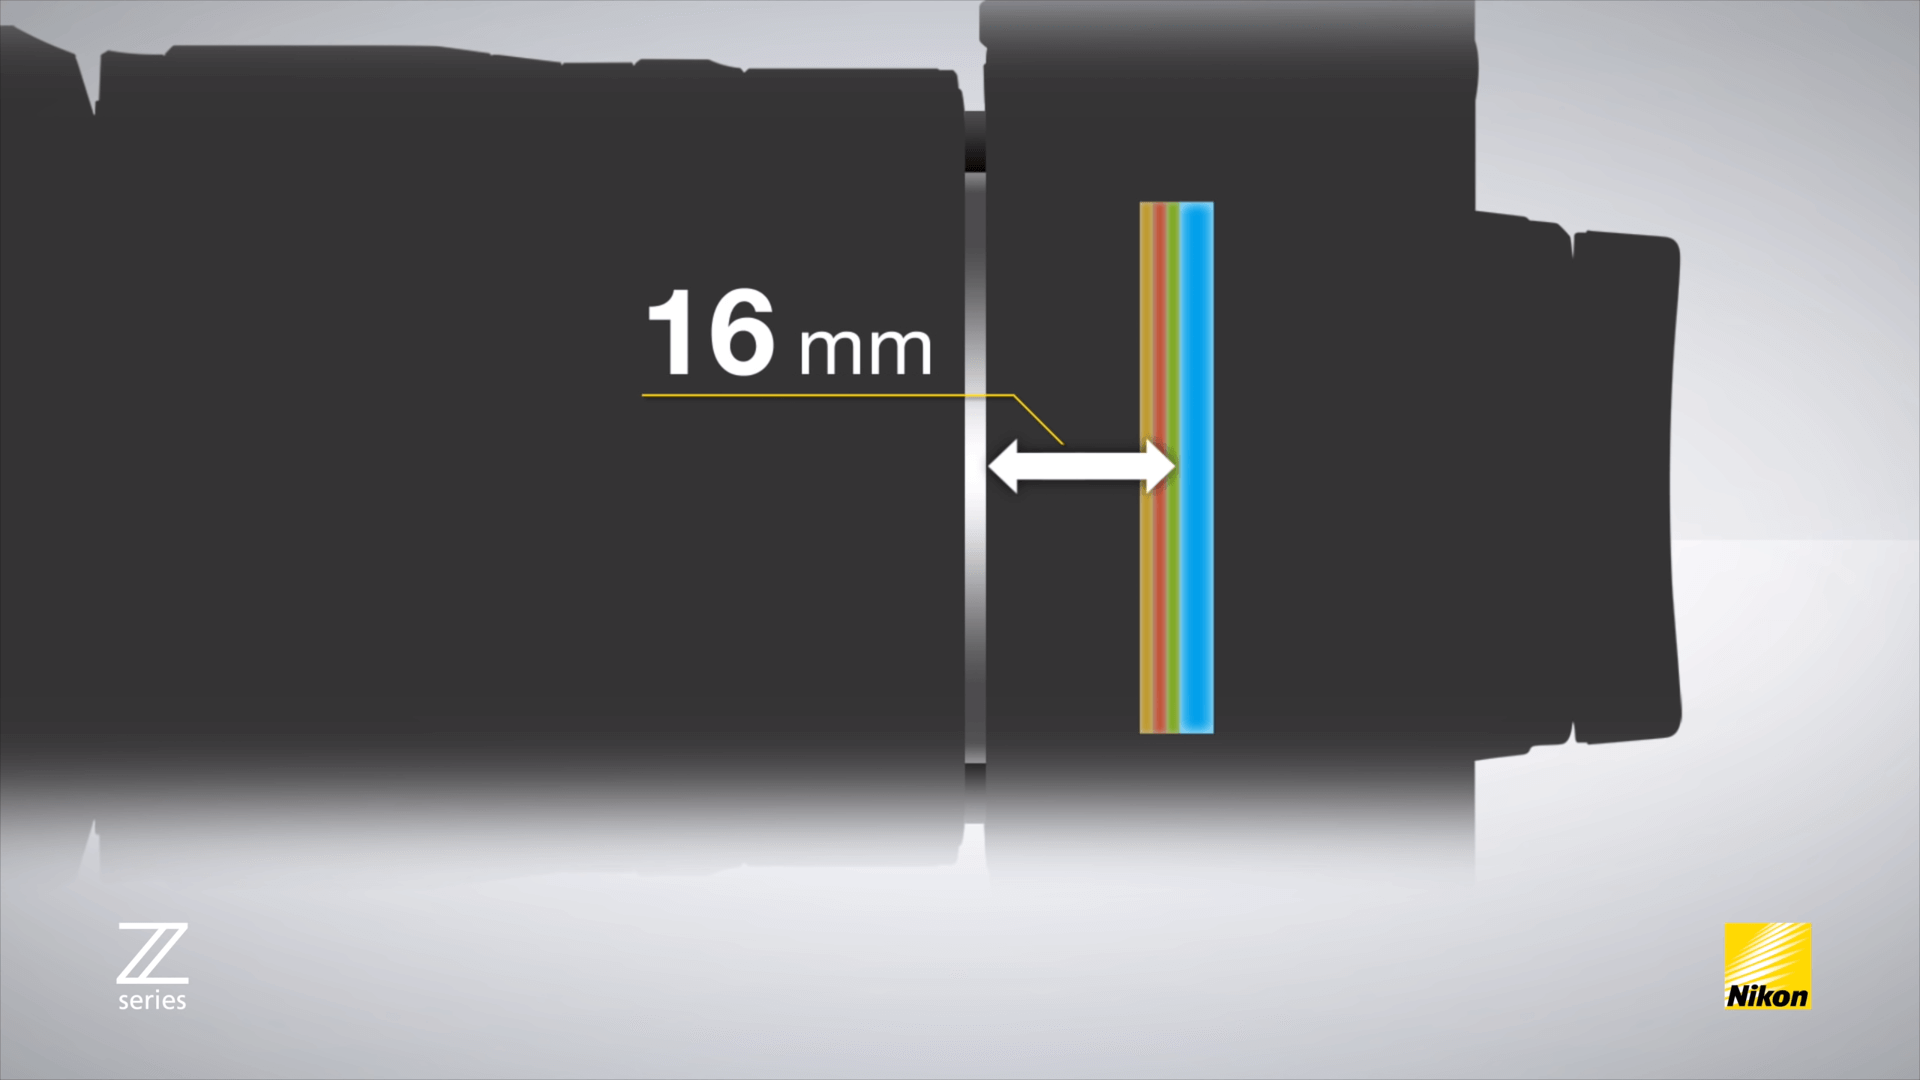 Nikon anuncia câmeras mirrorless full-frame com novo sistema Z-mount